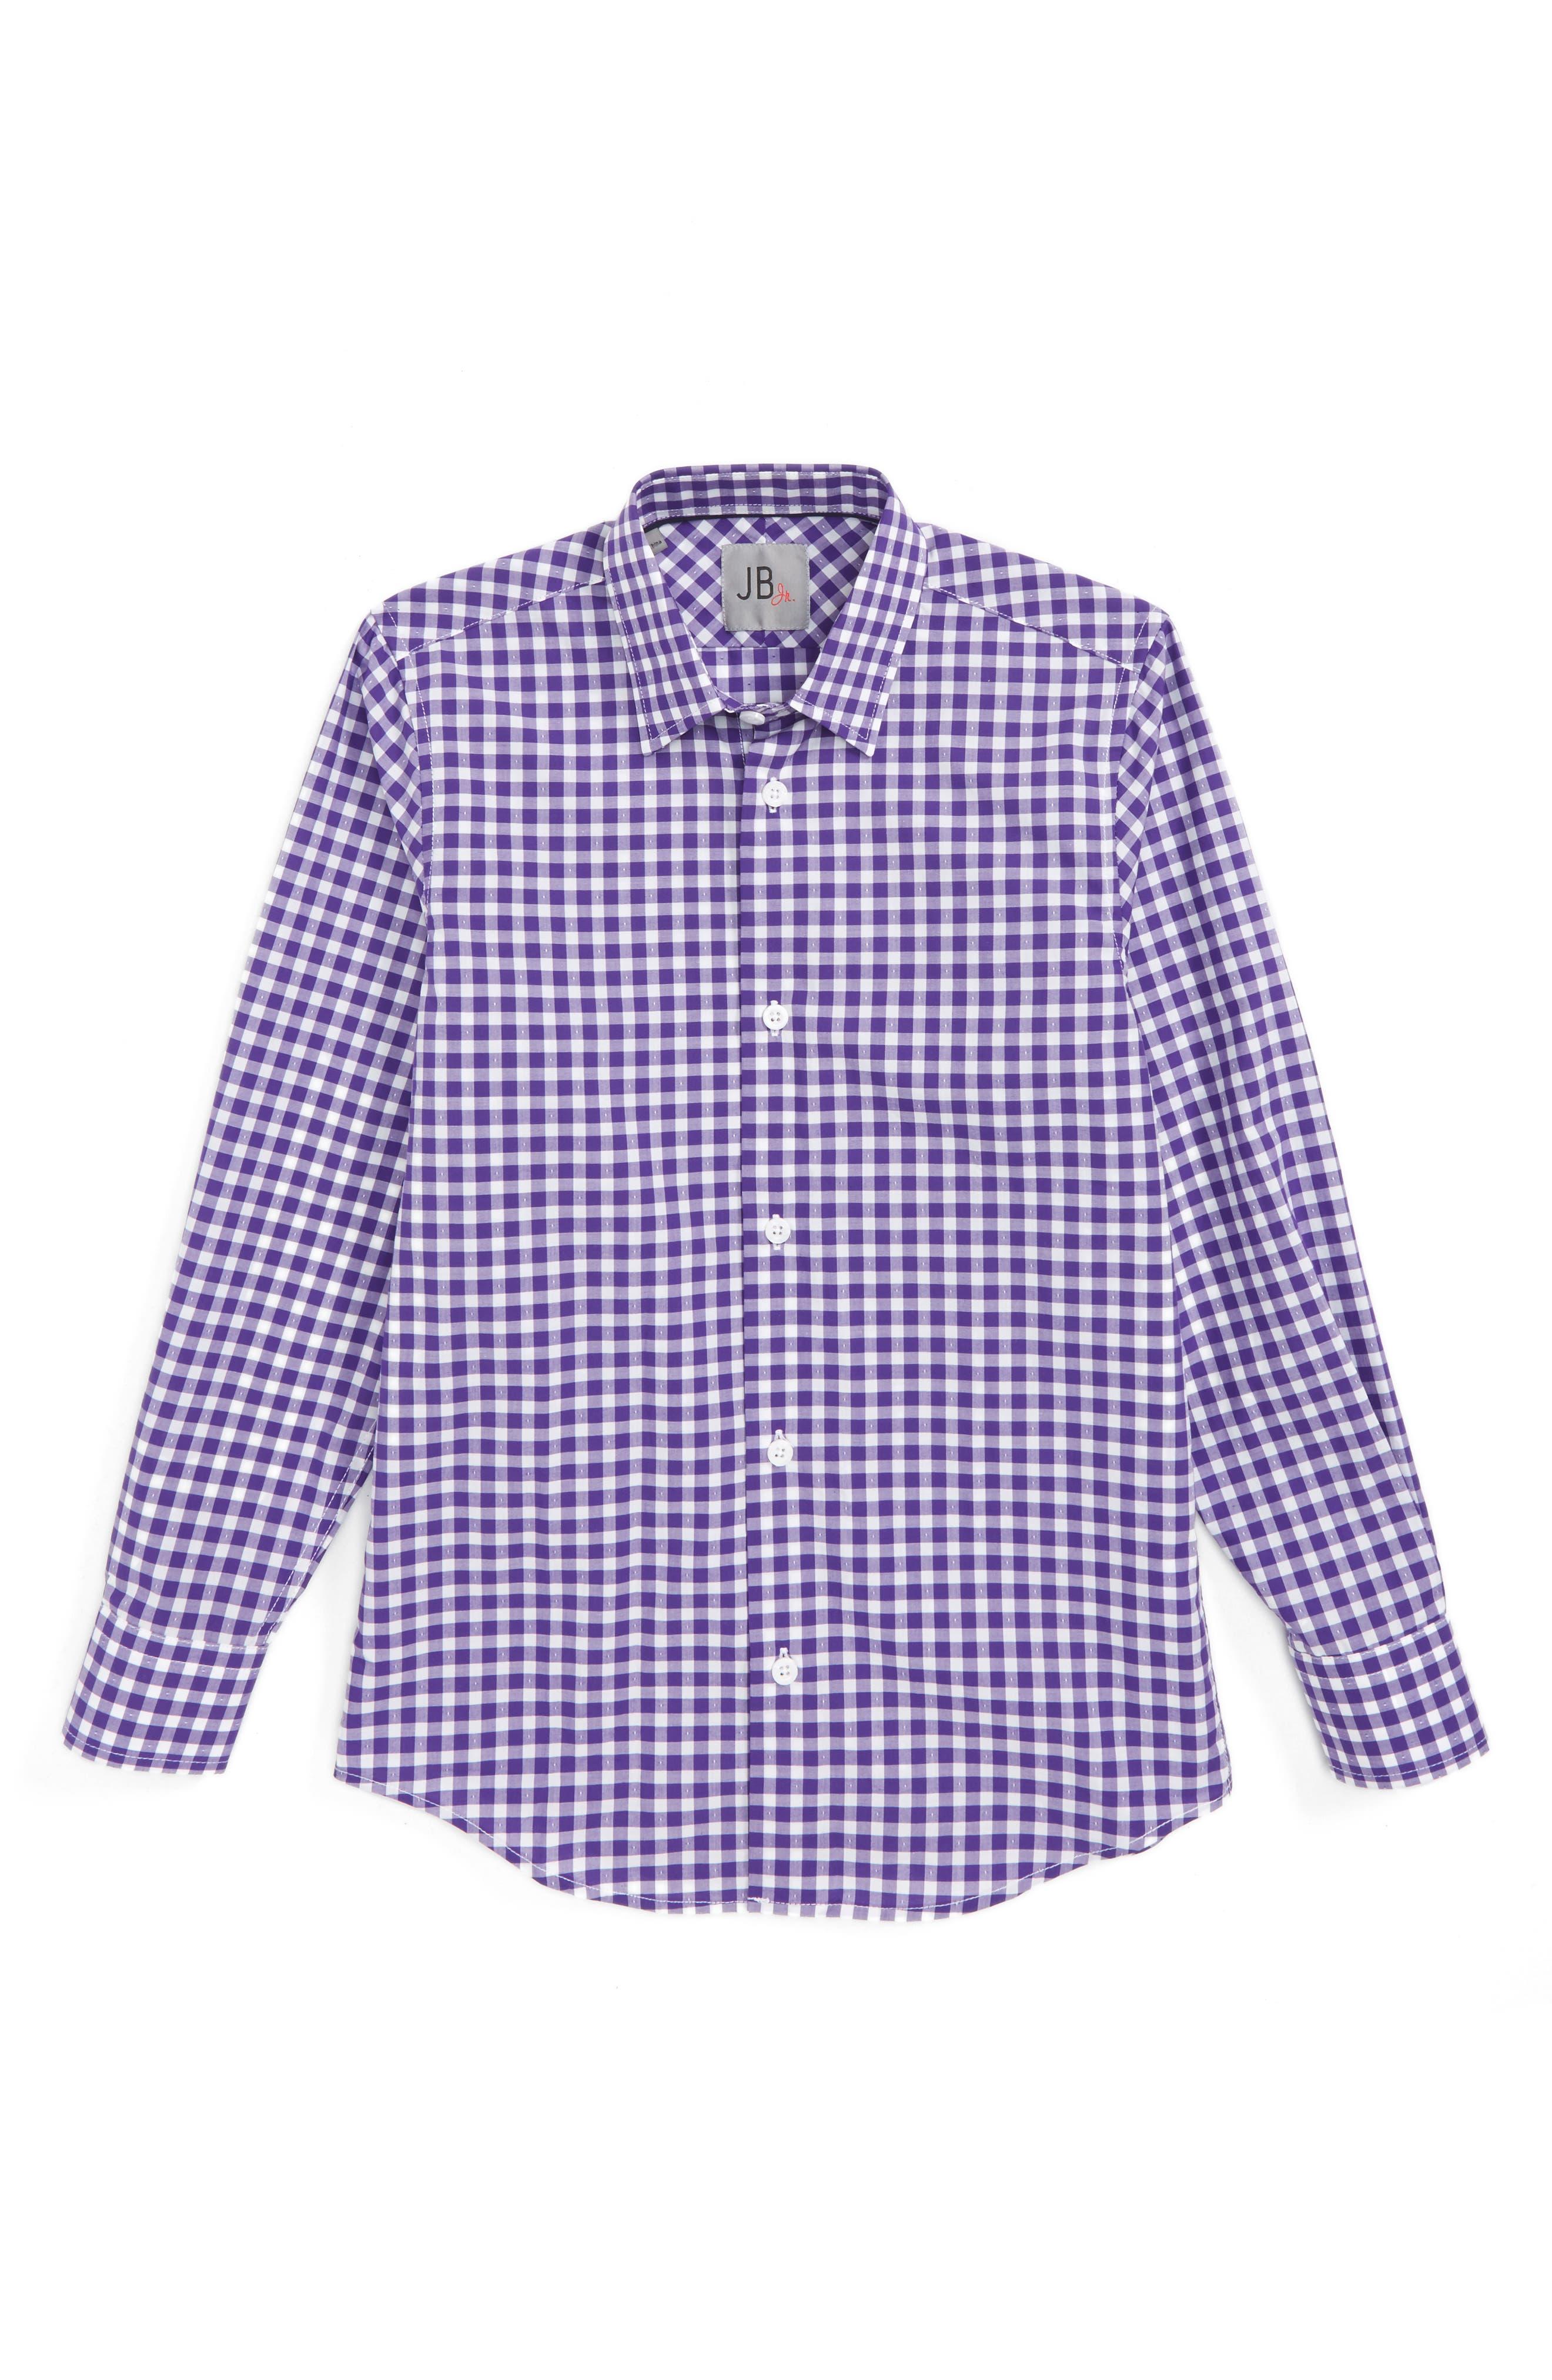 JB JR Check Dress Shirt, Main, color, 531